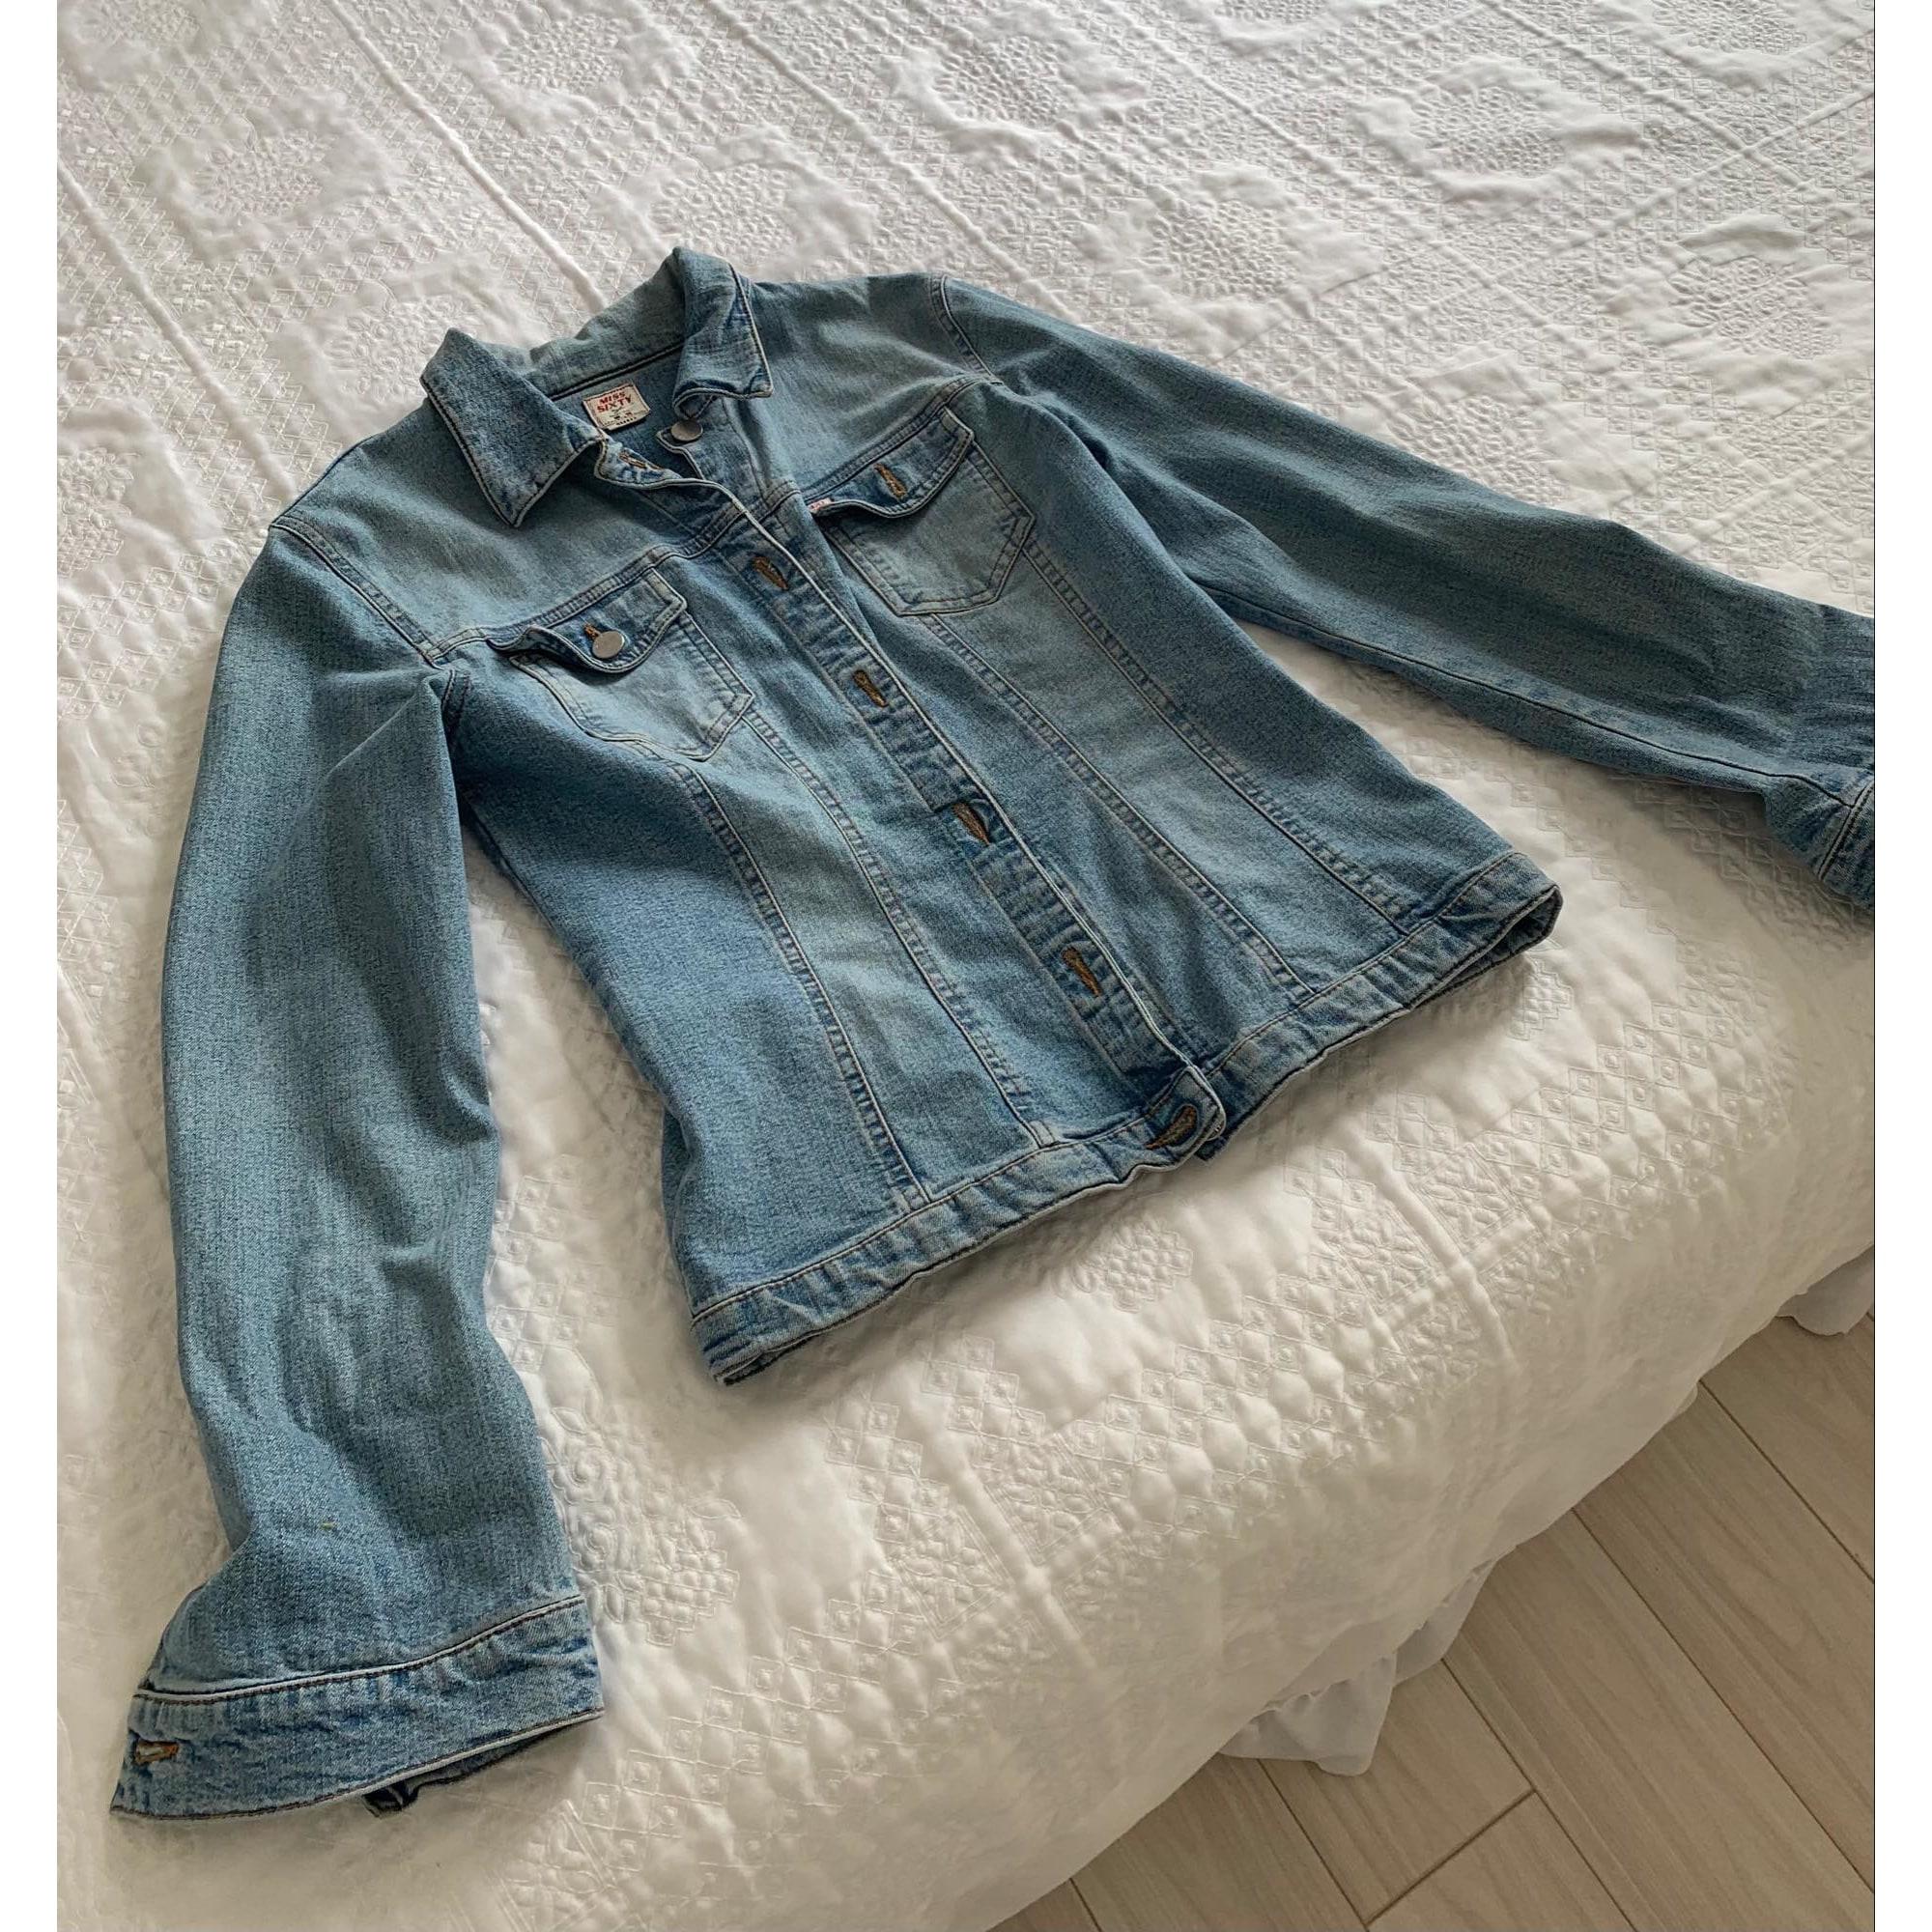 Blouson en jean MISS SIXTY Bleu, bleu marine, bleu turquoise